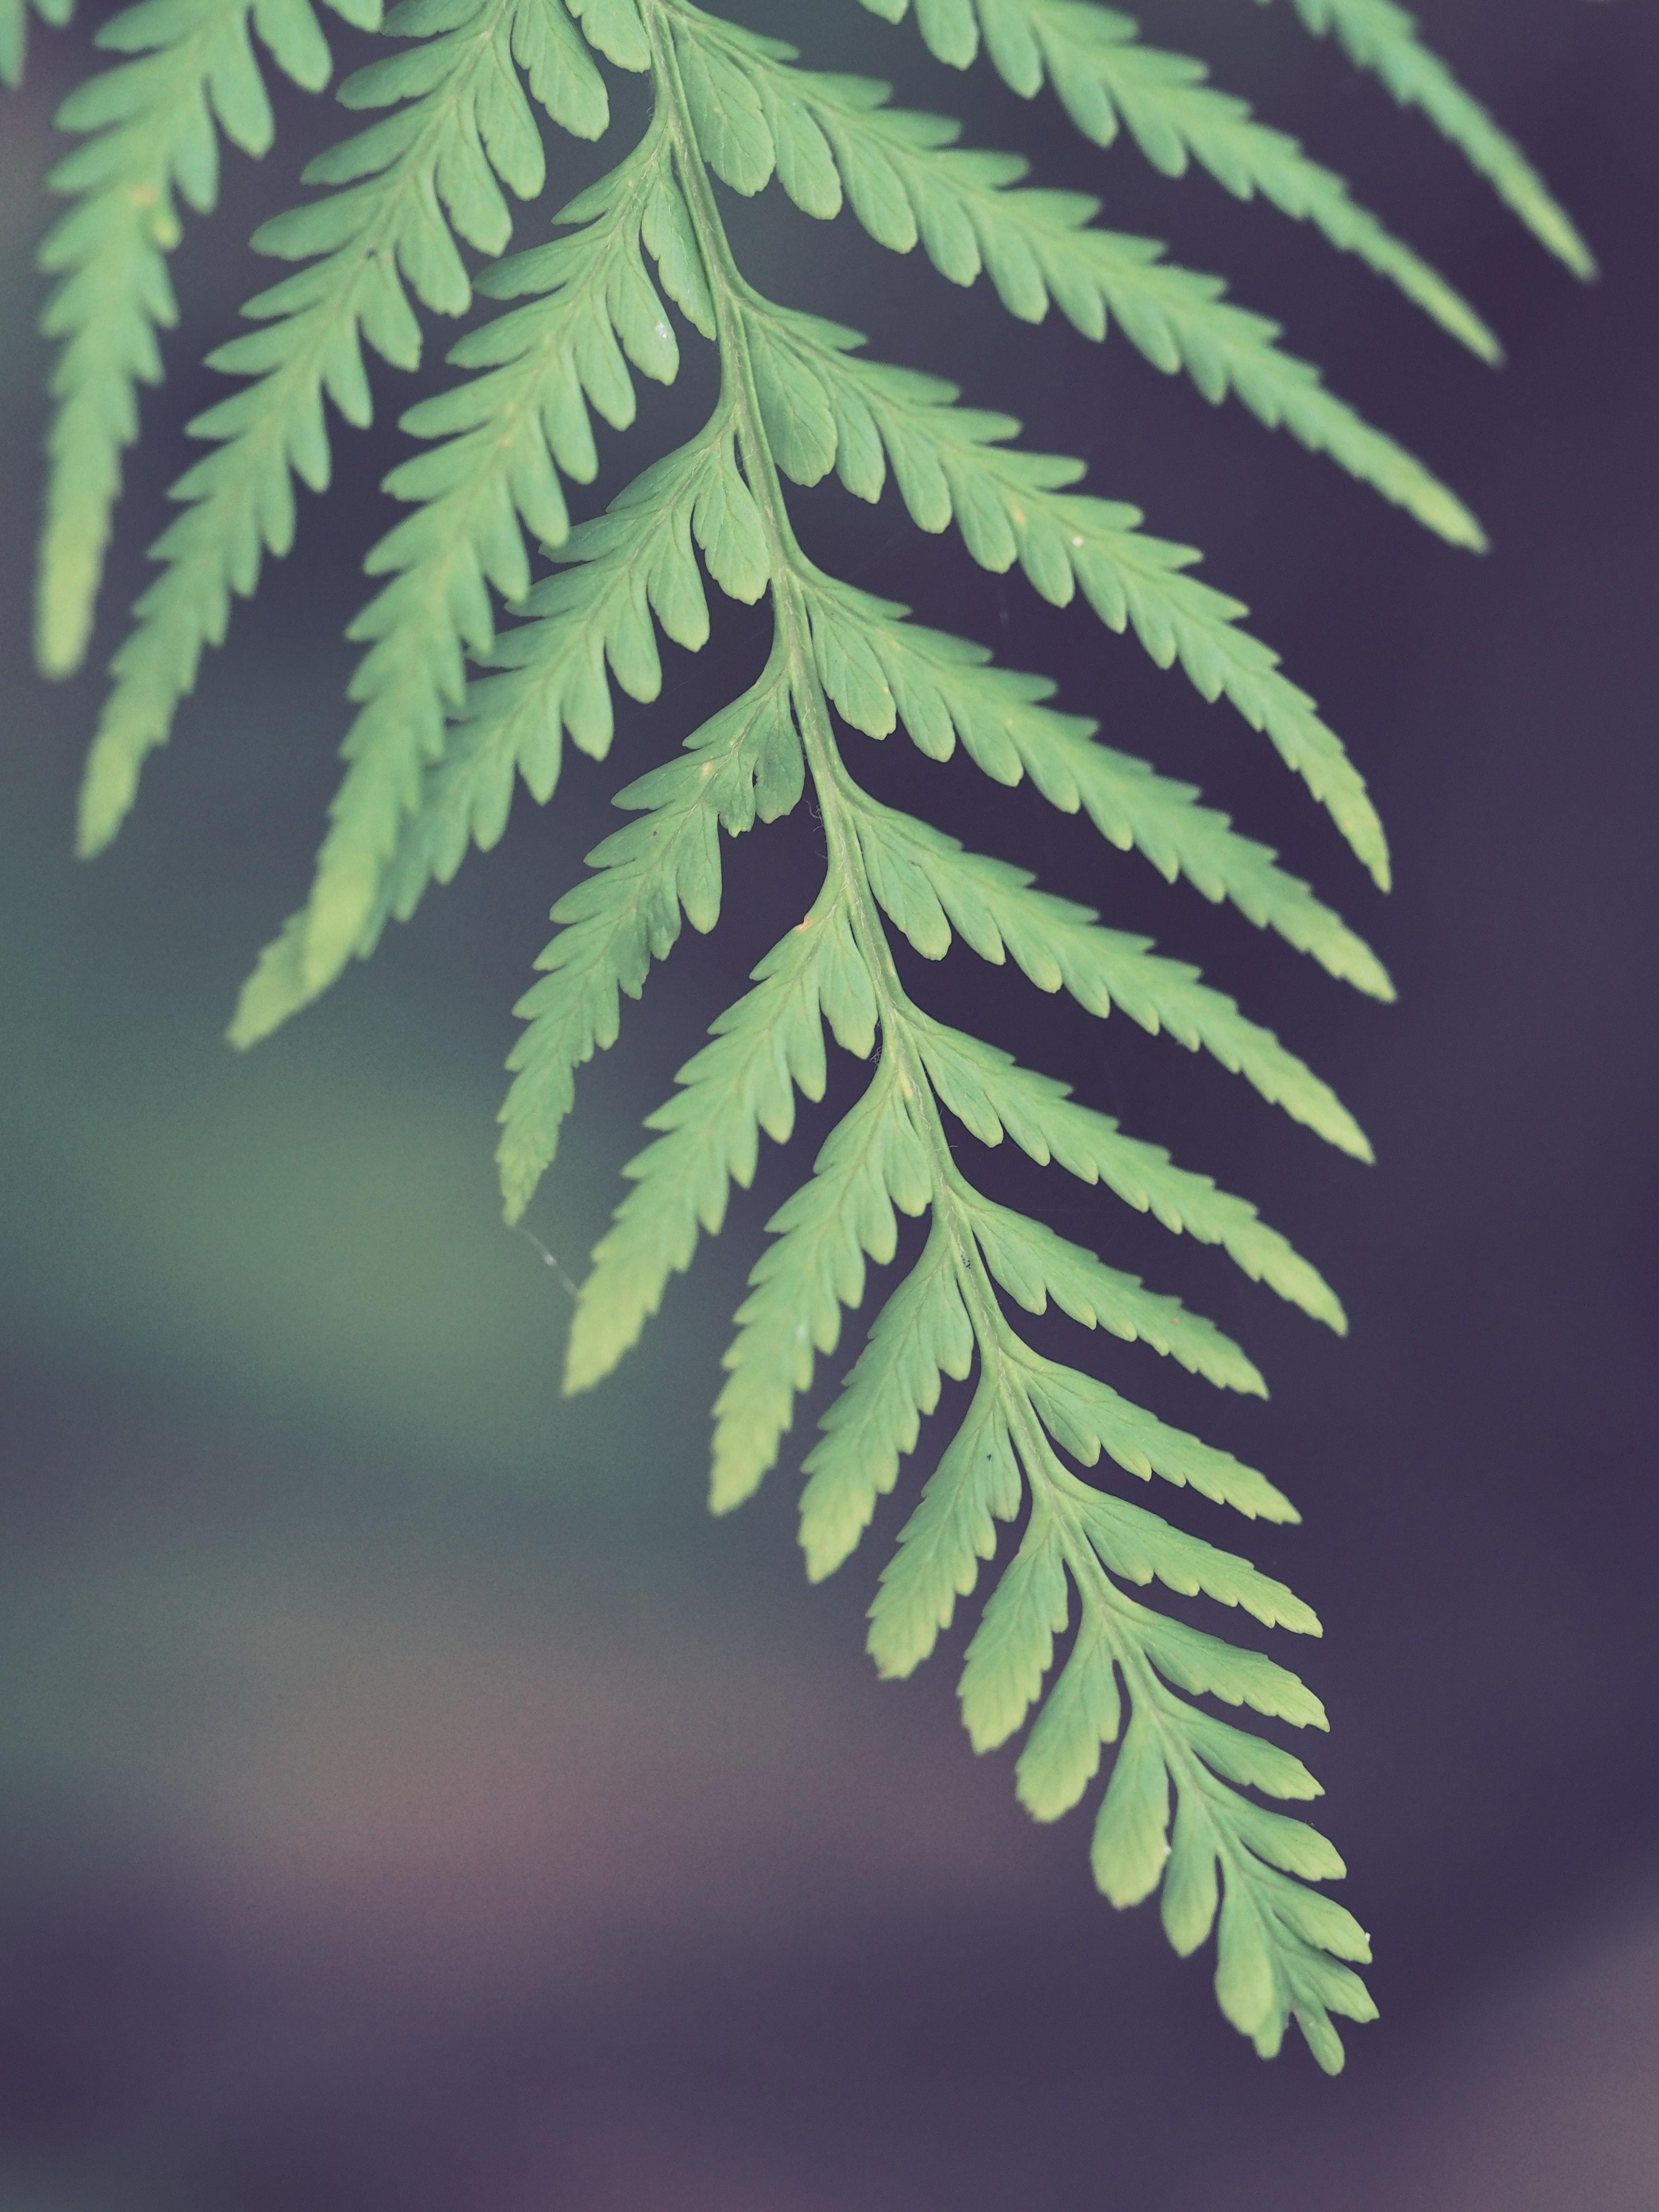 Selective photo of green leaf fern